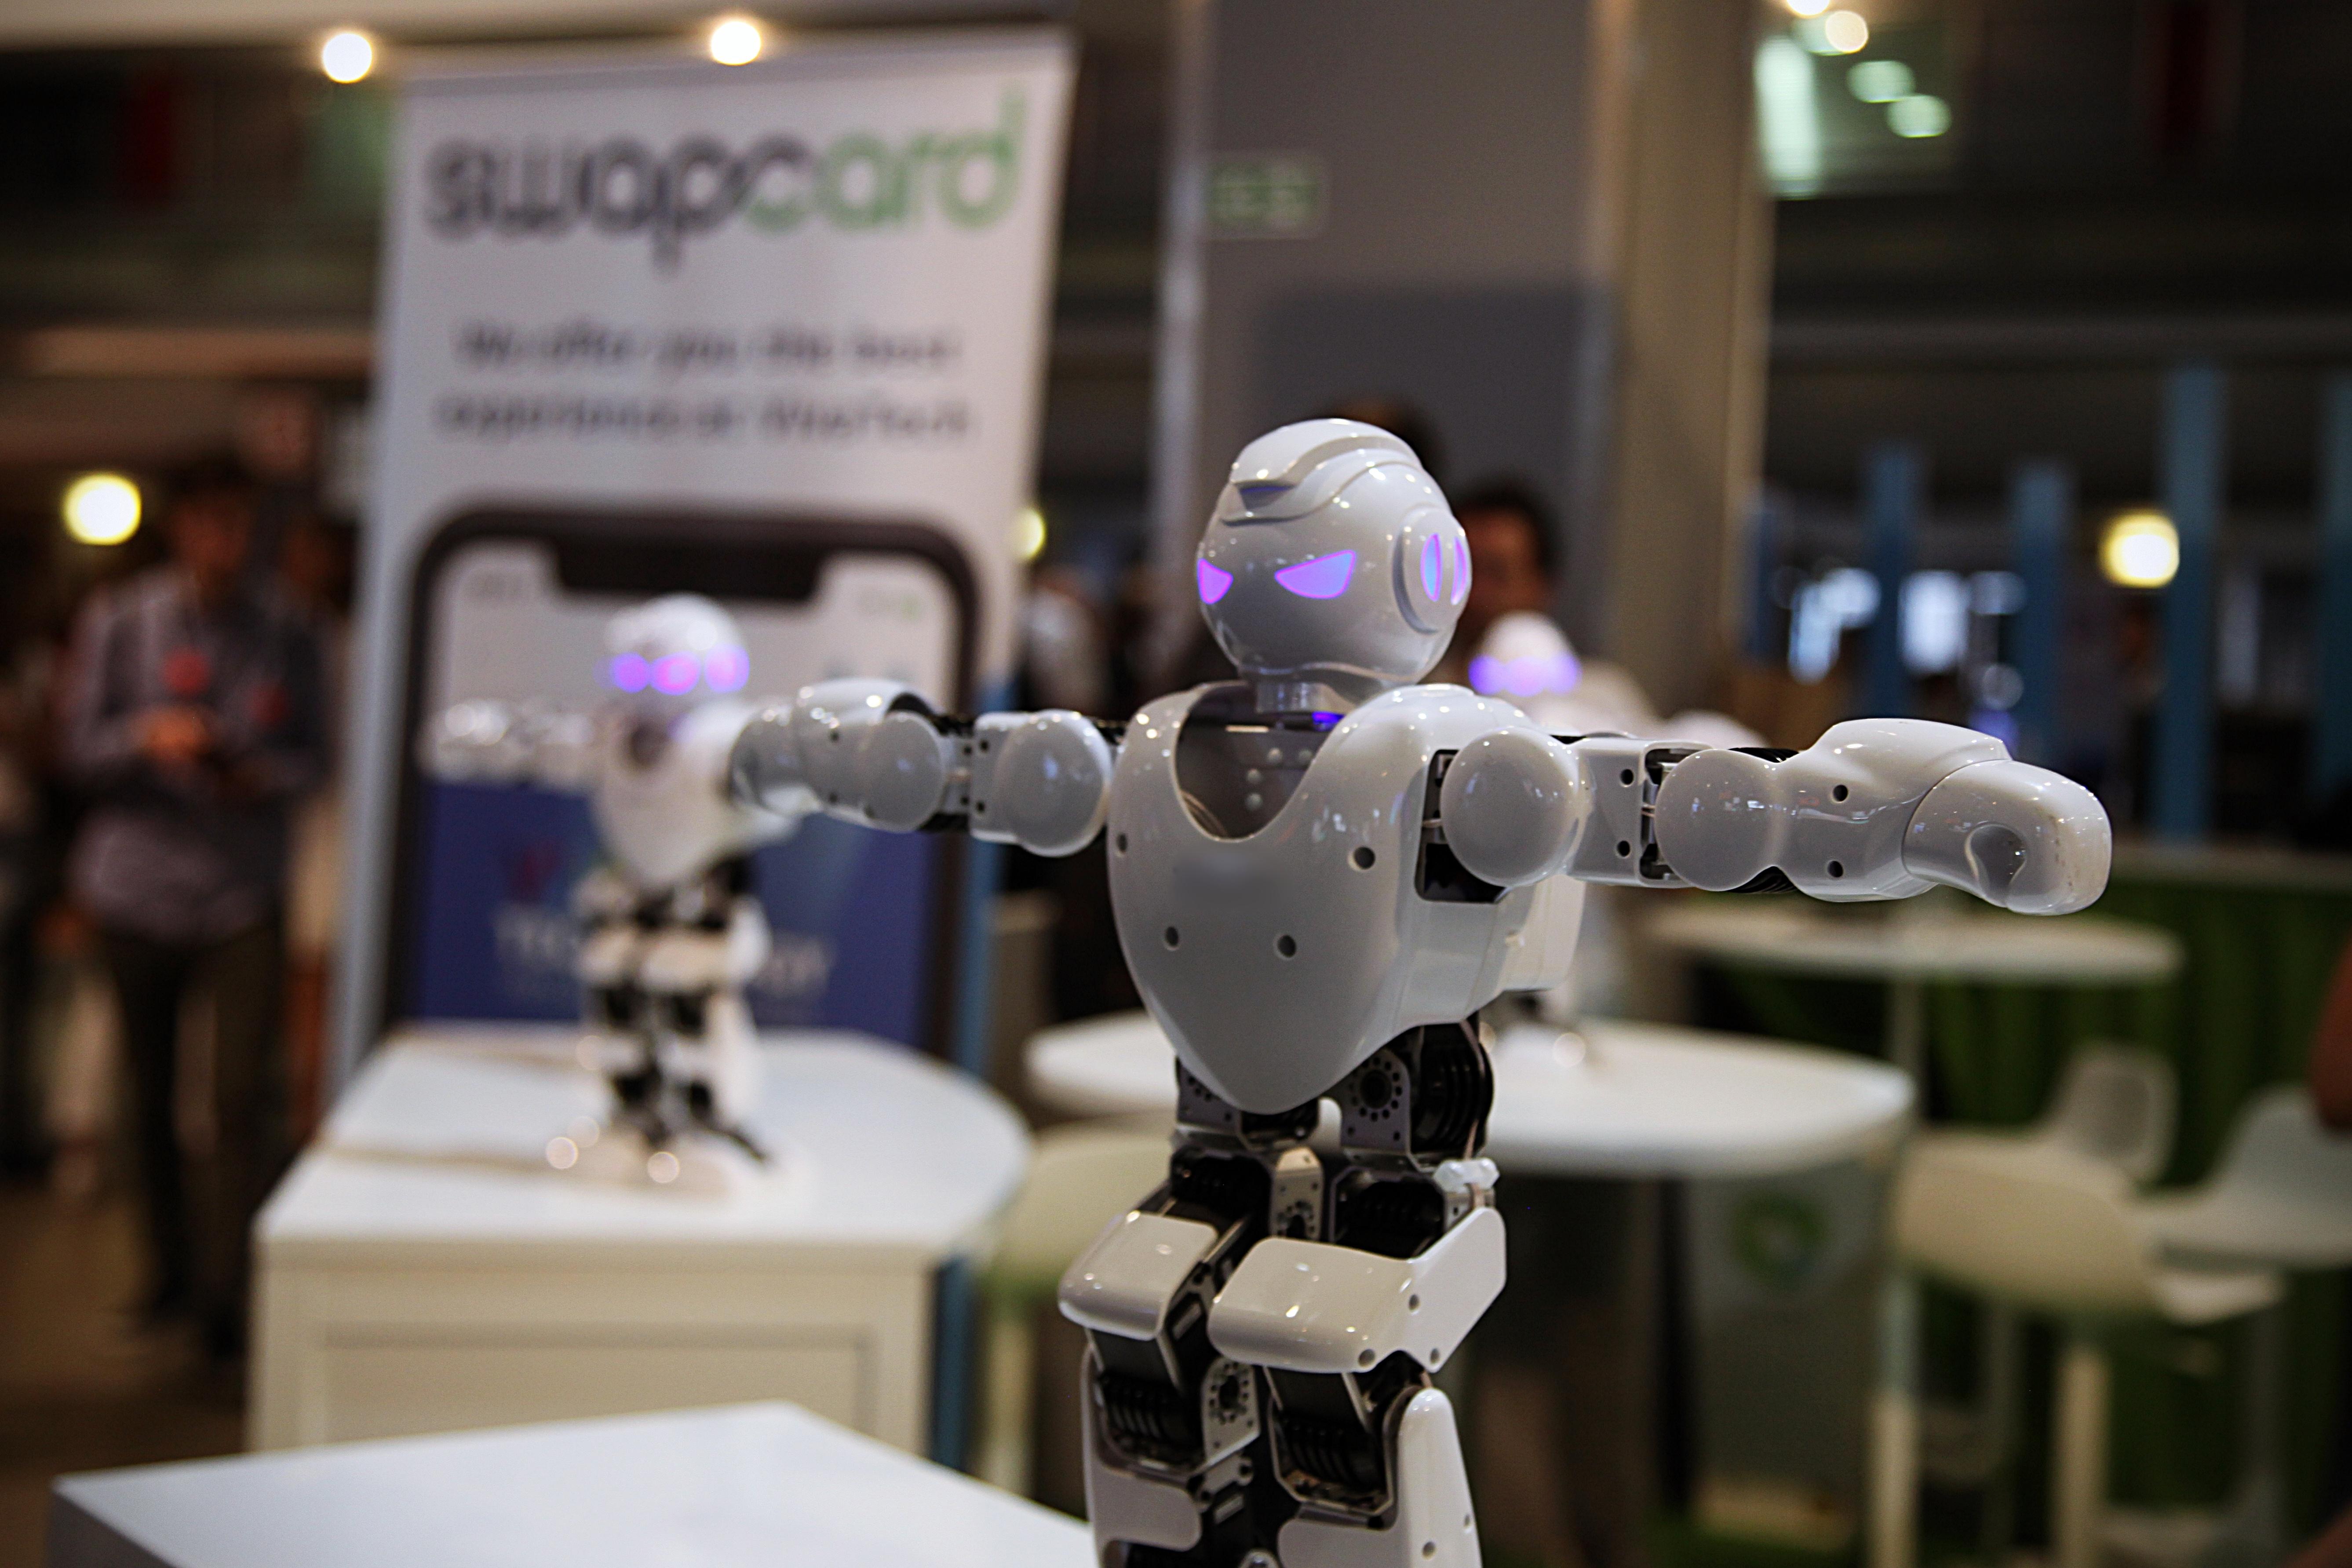 A dancing robots demo at Swapcard's booth at Viva Tech 2018